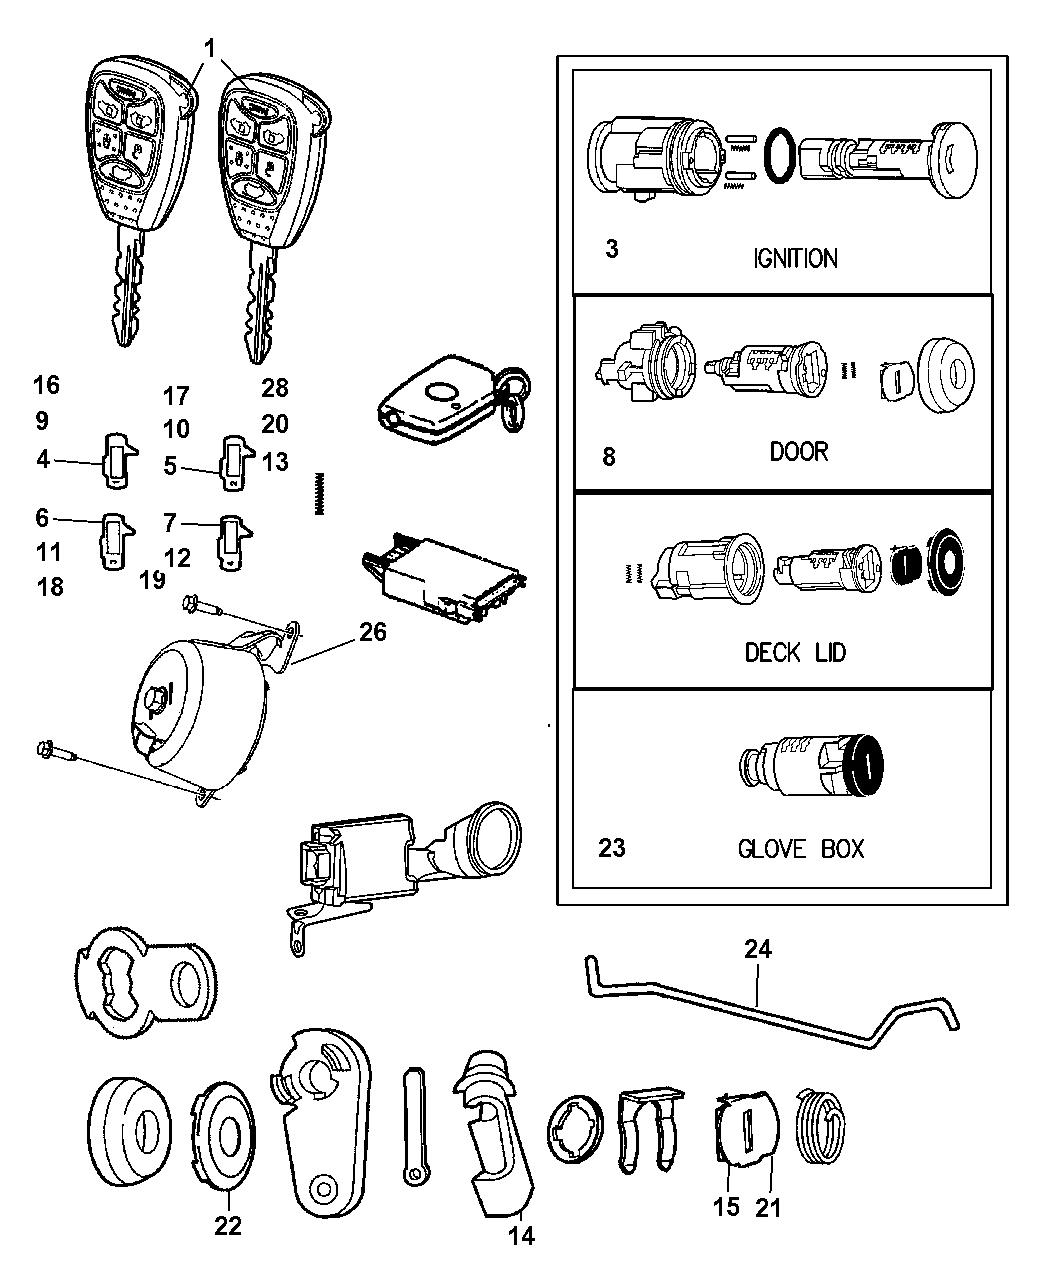 mopar 5179511aa  diagram of chrysler lock cyl #10